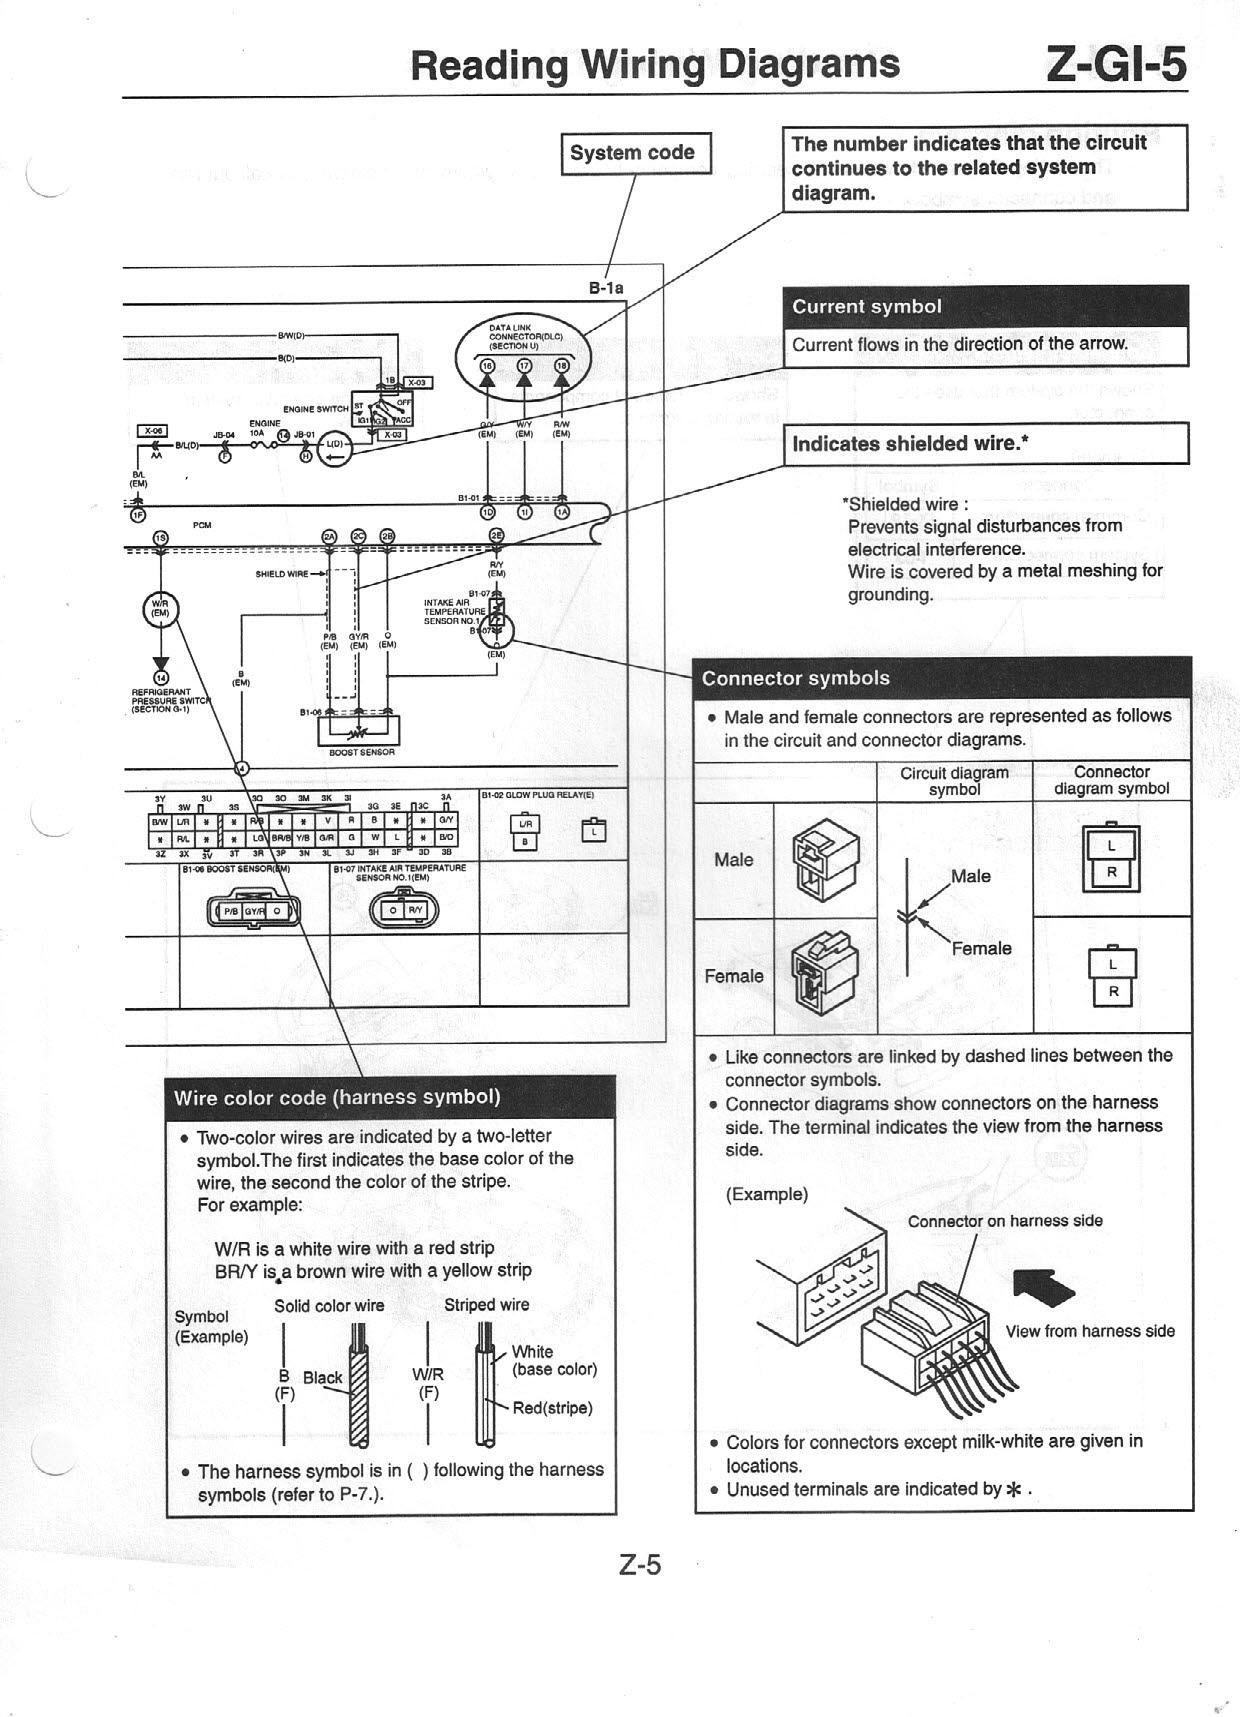 Pmx626 Info Us Mazda 626 Mx 6 Work Shop Manuals Scans 2001 Wiring Diagram